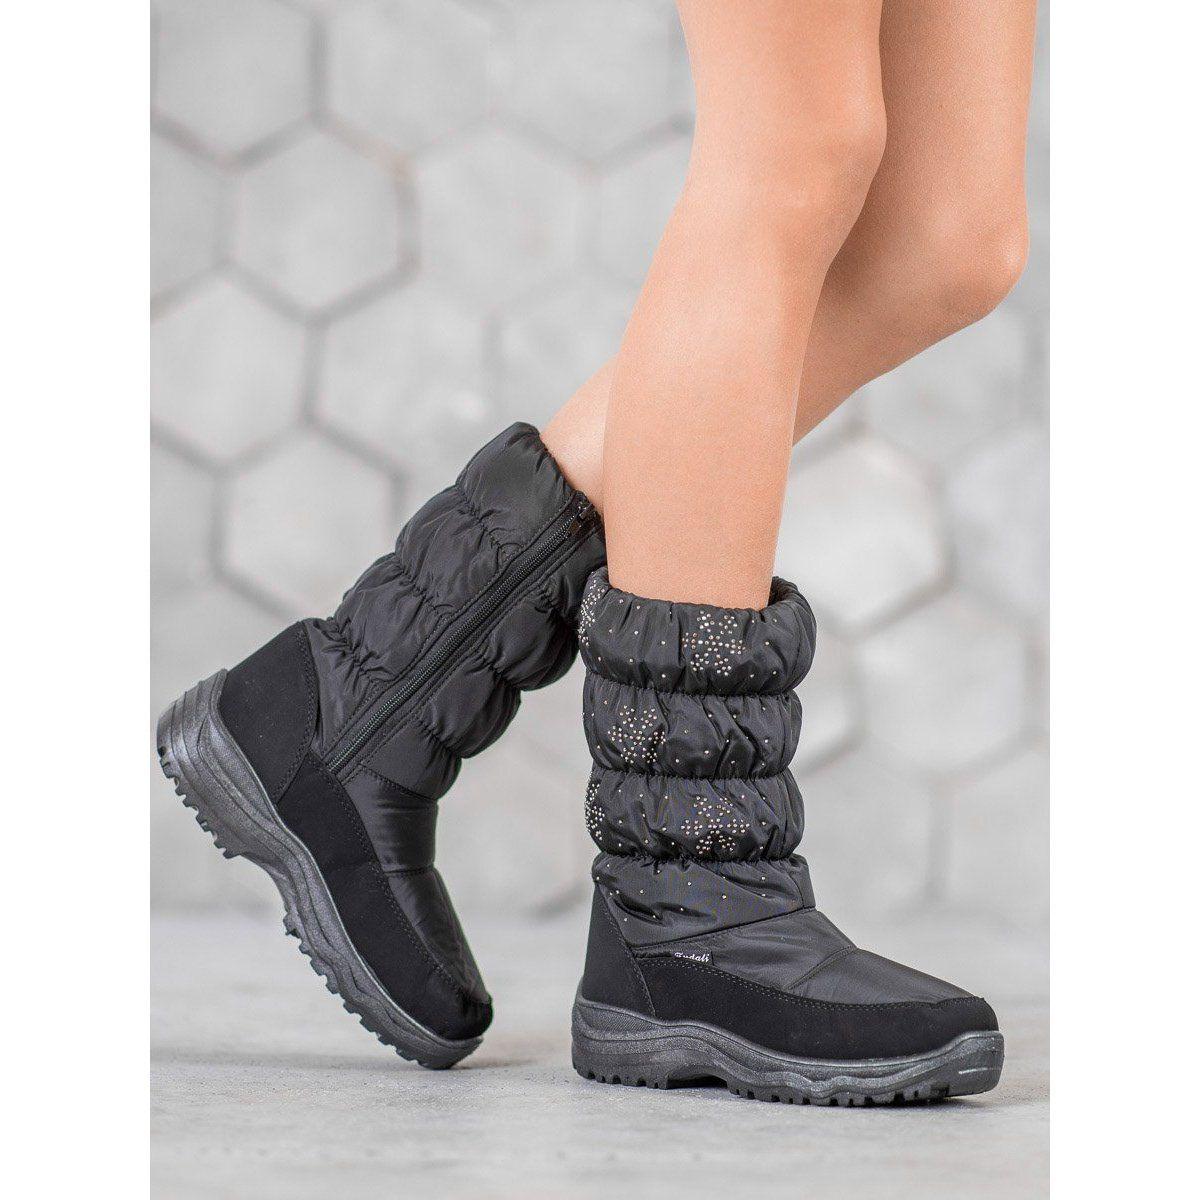 Shelovet Cieple Sniegowce Na Platformie Czarne All Black Sneakers Boots Black Sneaker